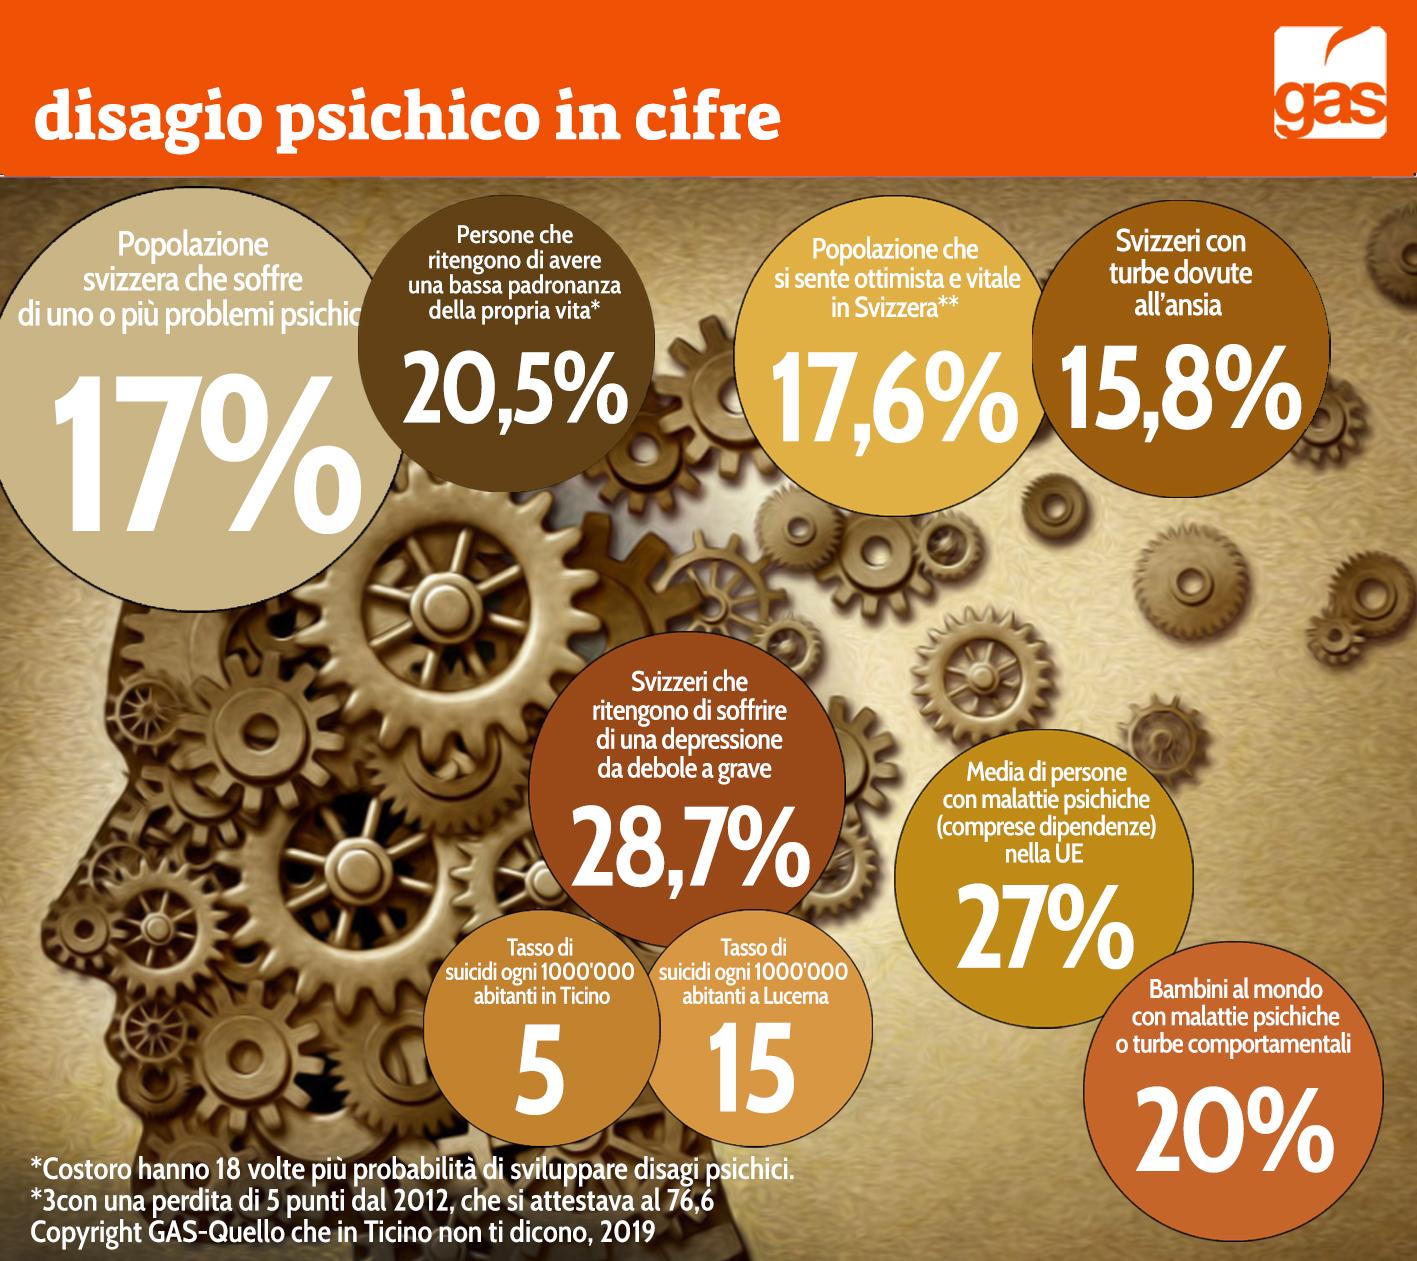 Le cifre del disagio psichico